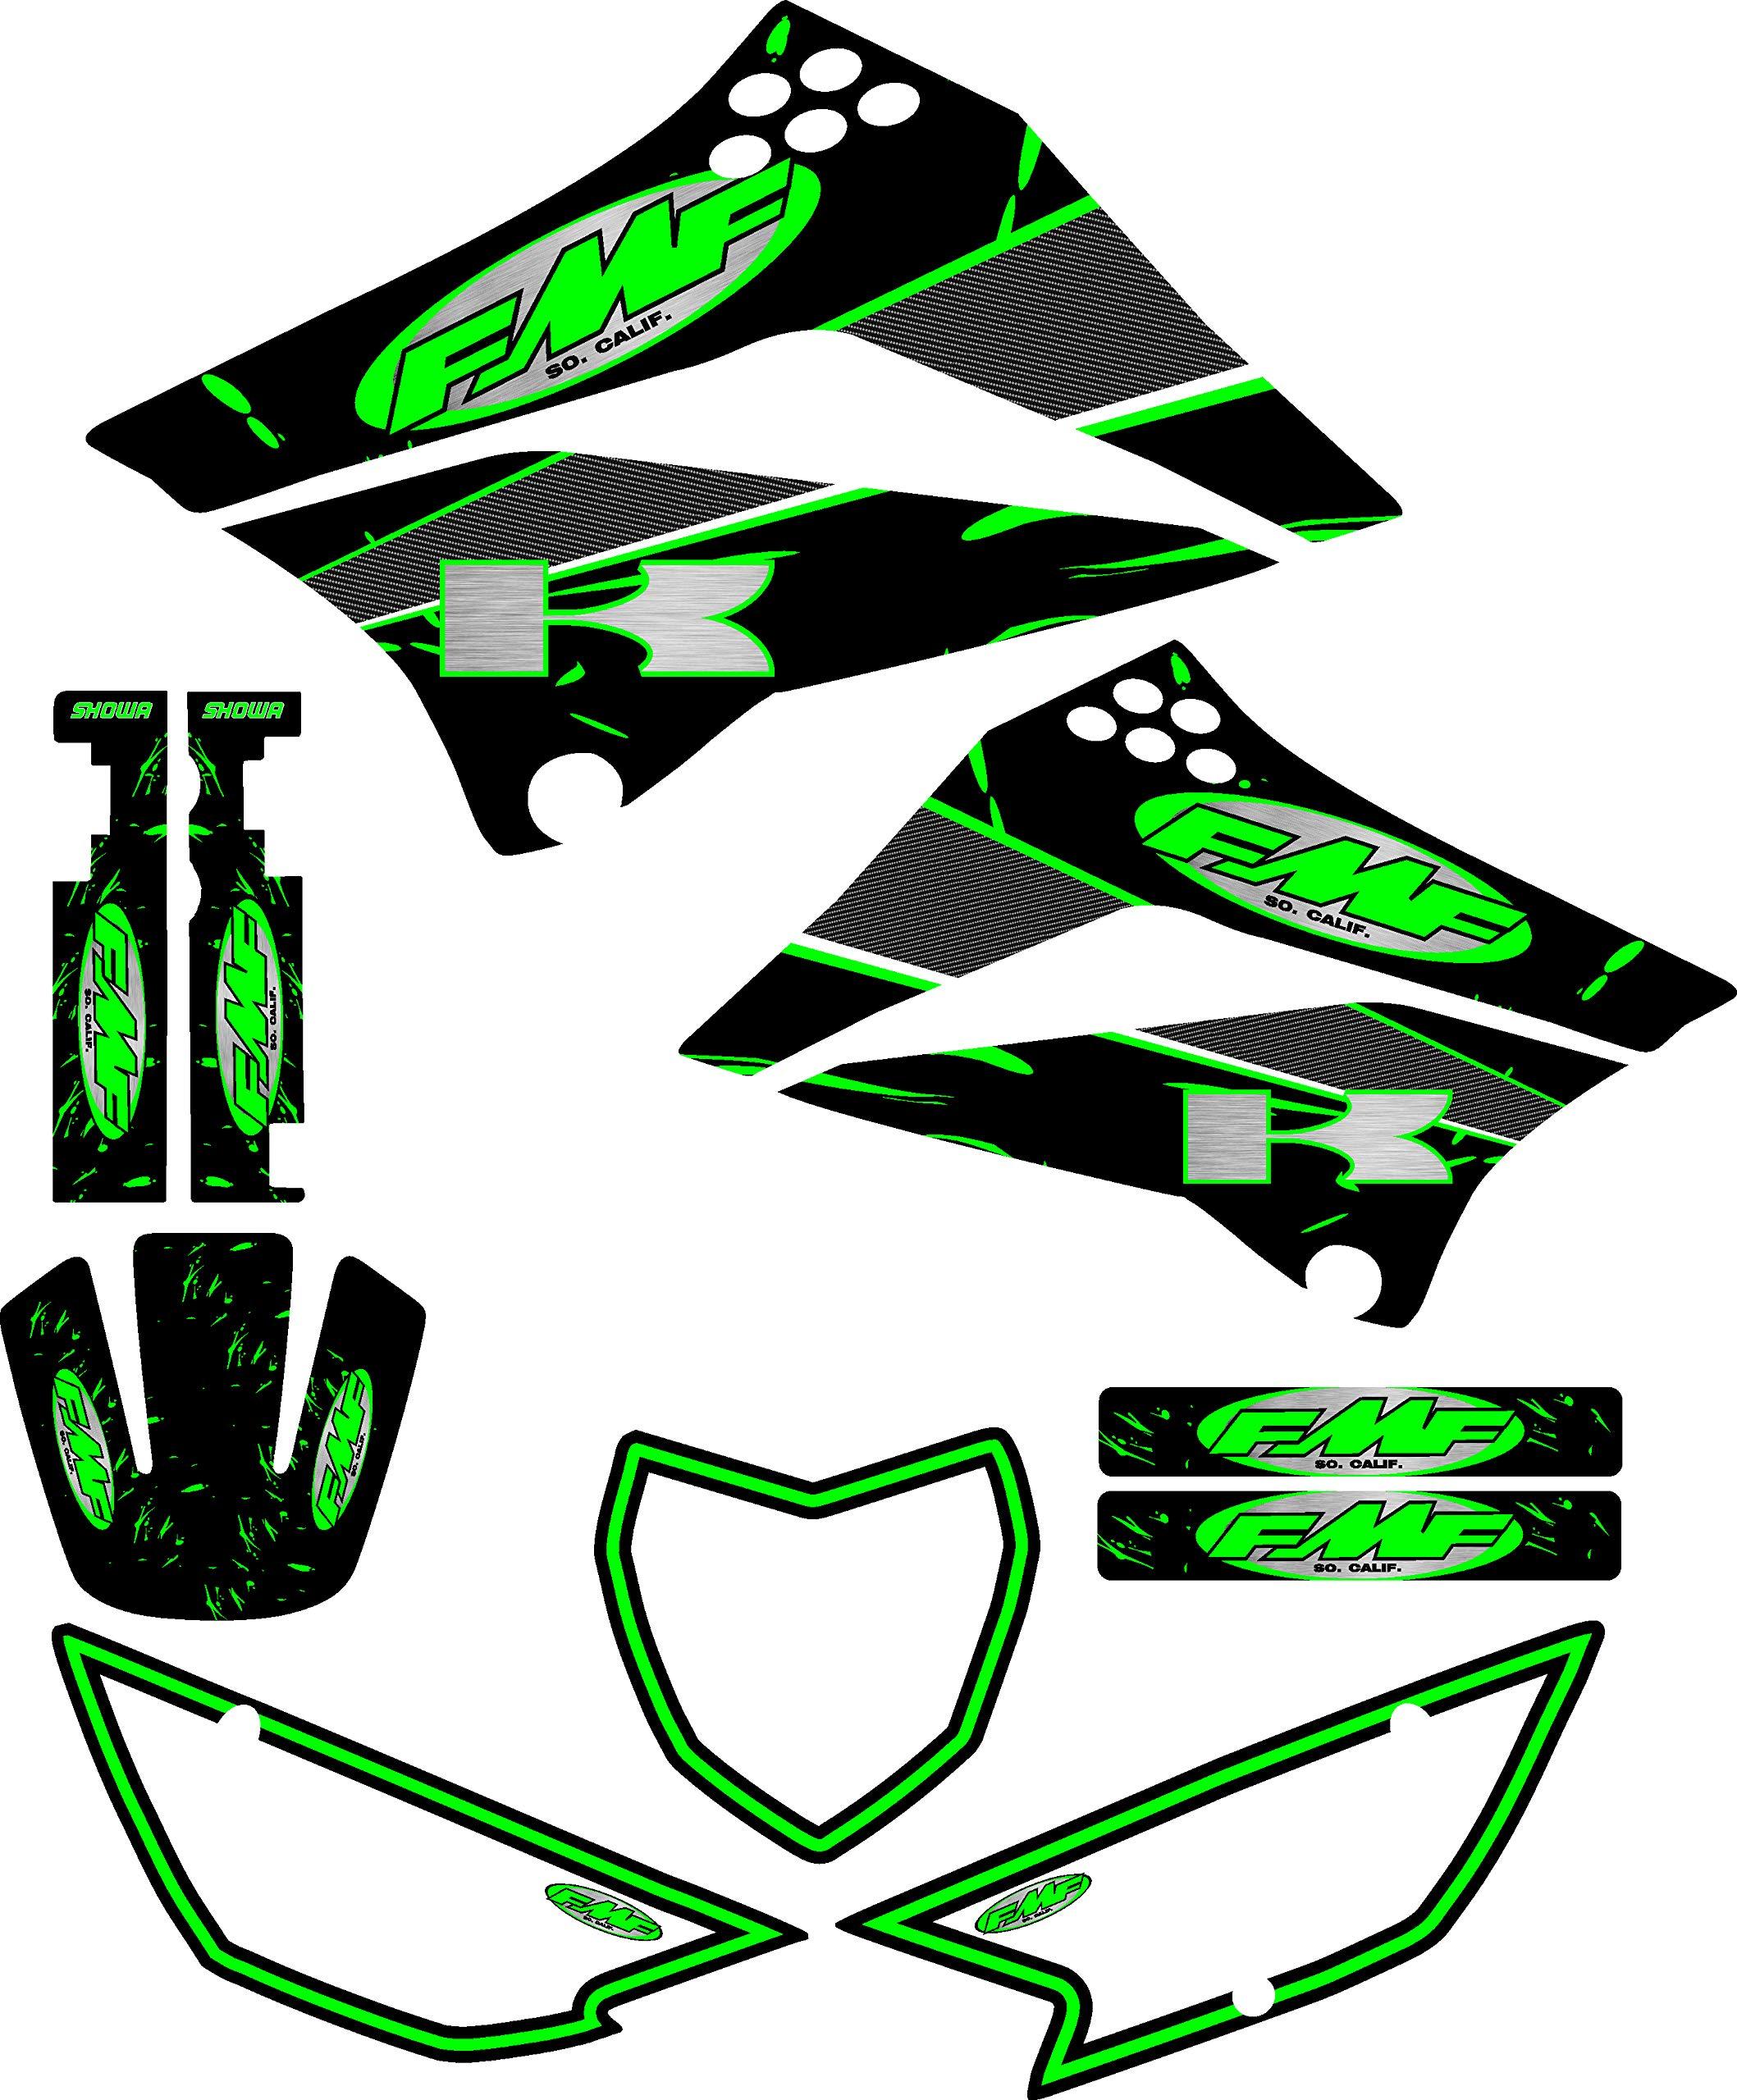 FMF Exhaust Graphics fit Kawasaki KLX 110 10-18 Graphic Kit Sticker KLX110 Green